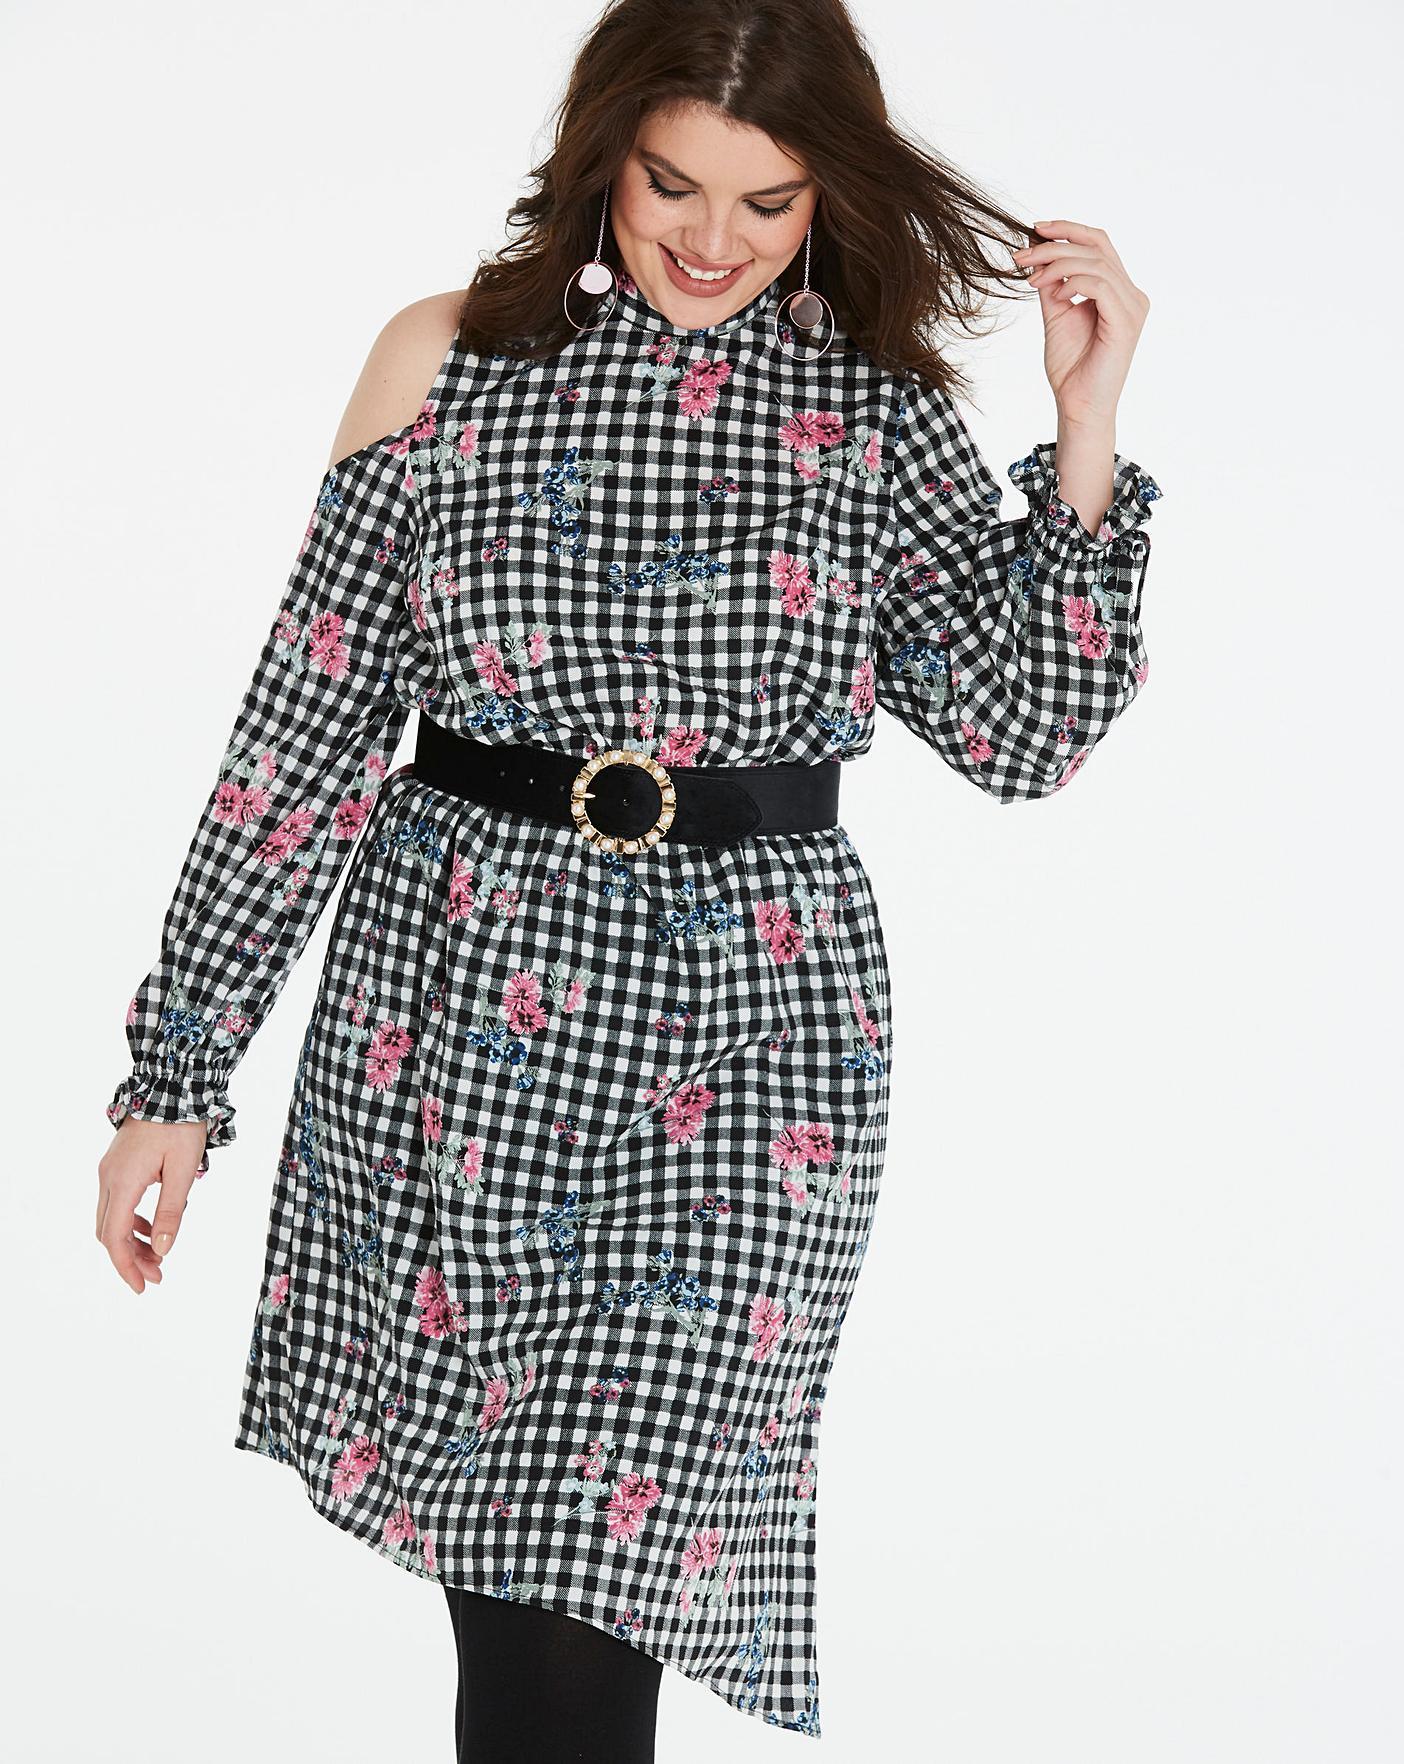 Dress Code{Contrast Collar Dress + Gingham Coat} Closet